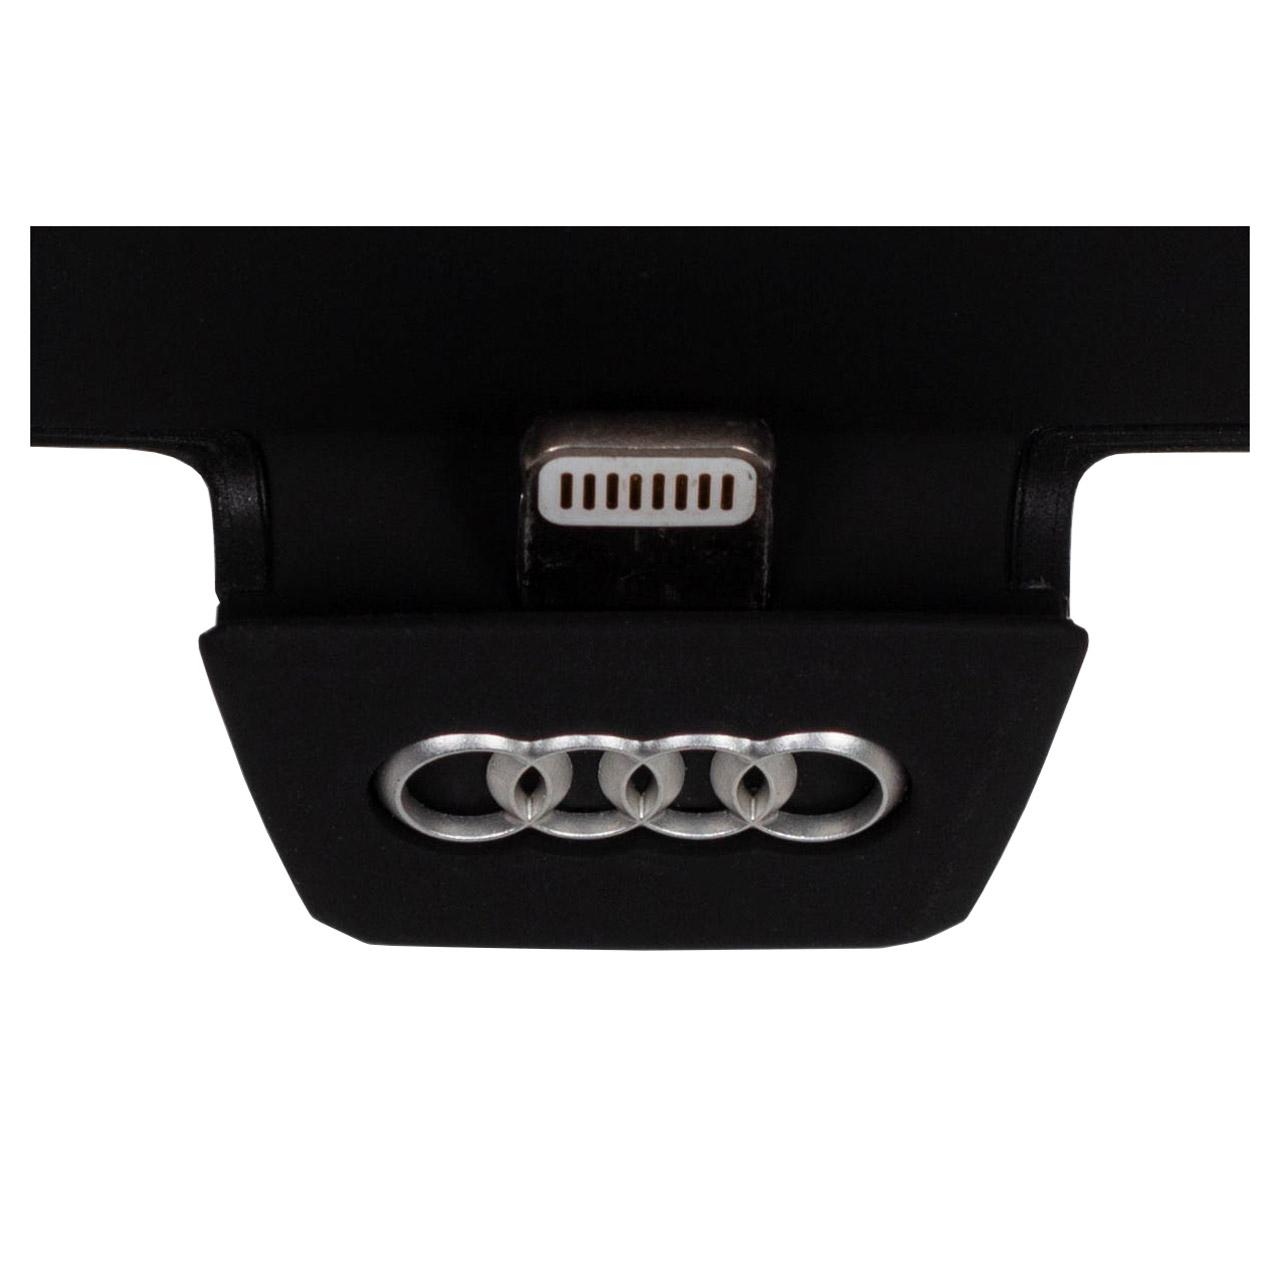 ORIGINAL Audi Ladehülle Handycover Induktive Wireless Laden iPhone 6 6s 8W0051435